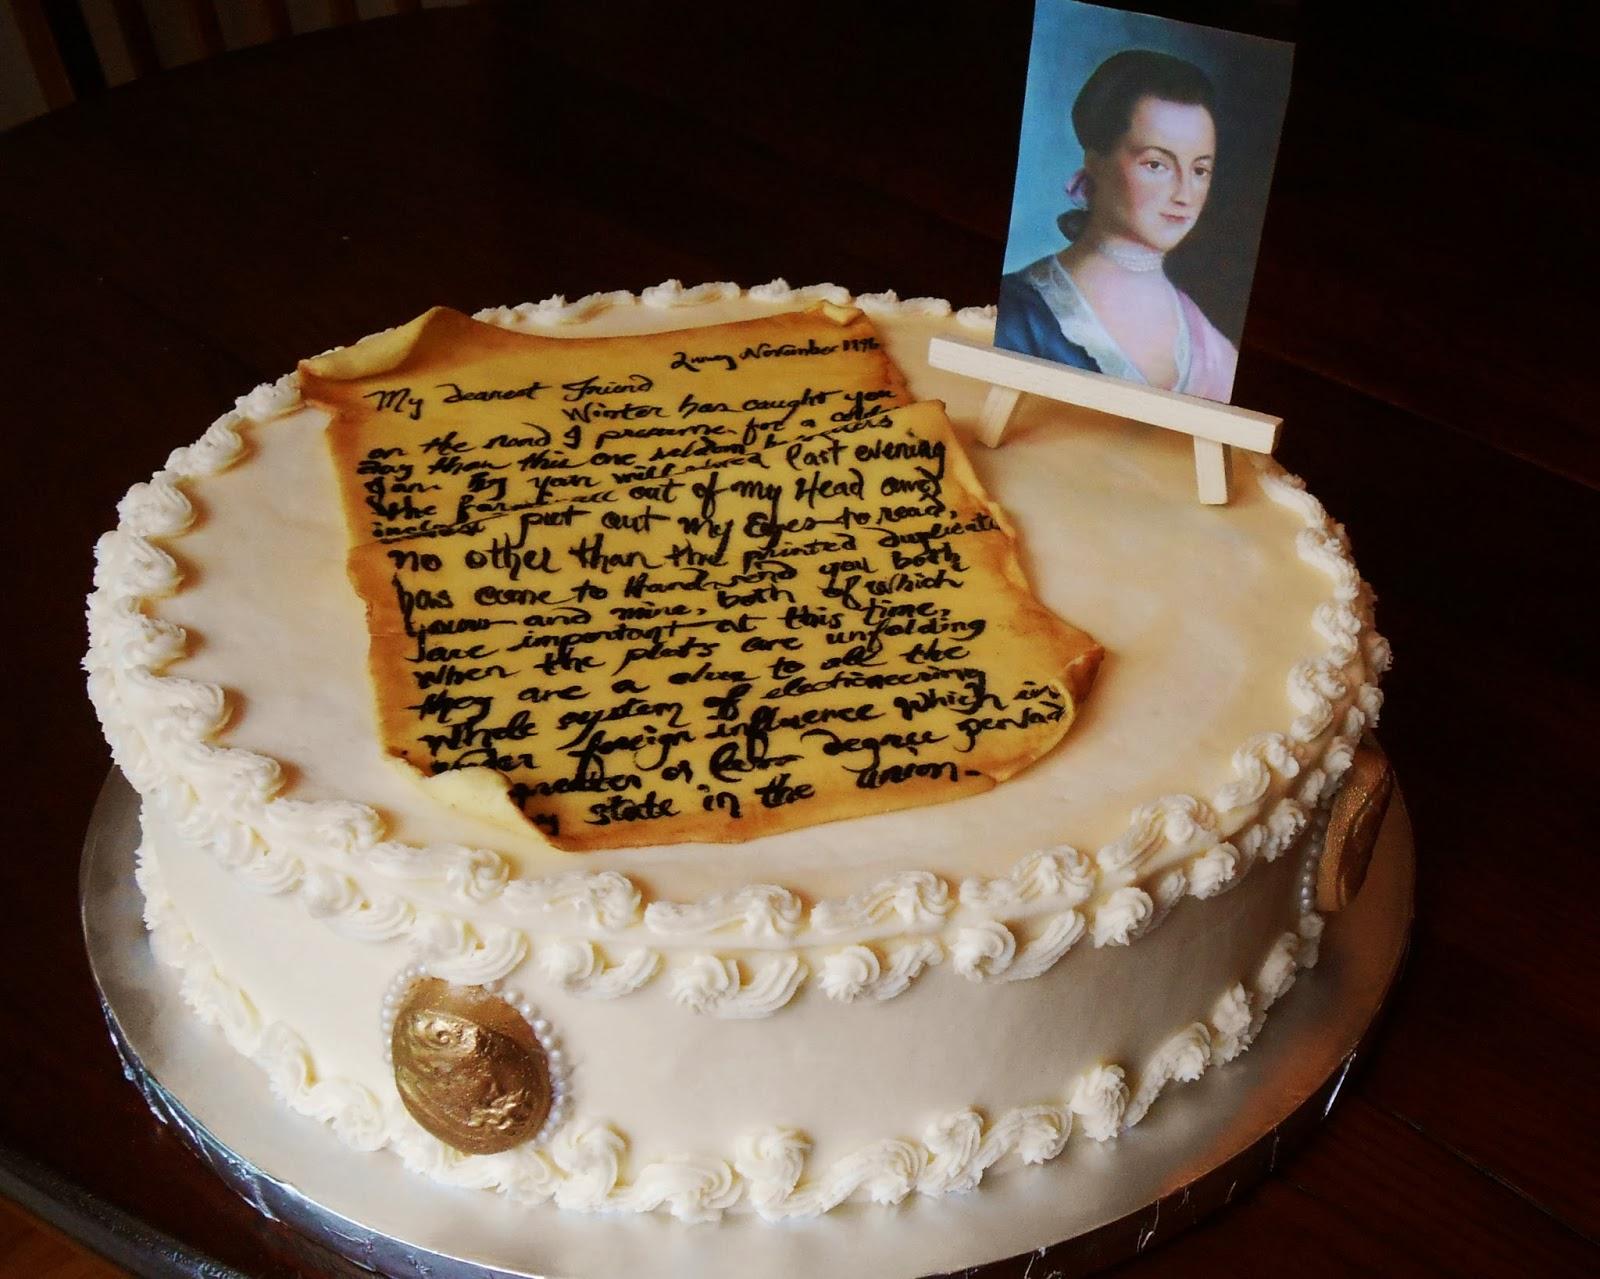 Abigail Adams Cake